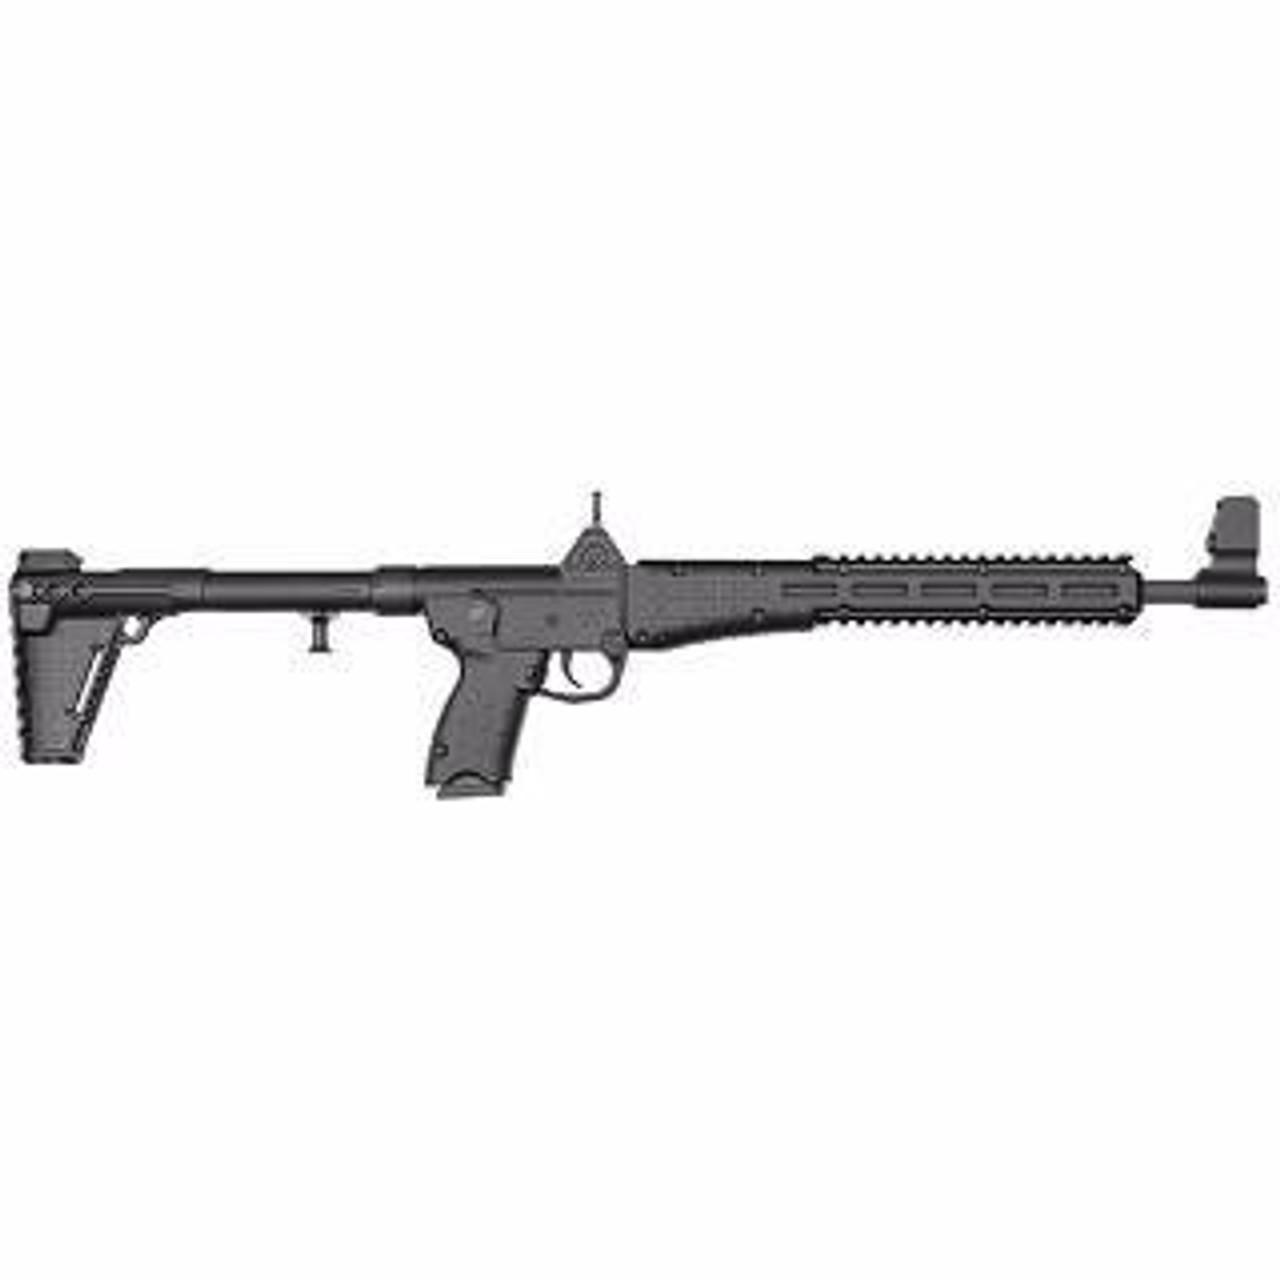 Kel Tec Sub2000 Gen 2- Beretta 92/M9 Mags- CALIFORNIA LEGAL- 9mm